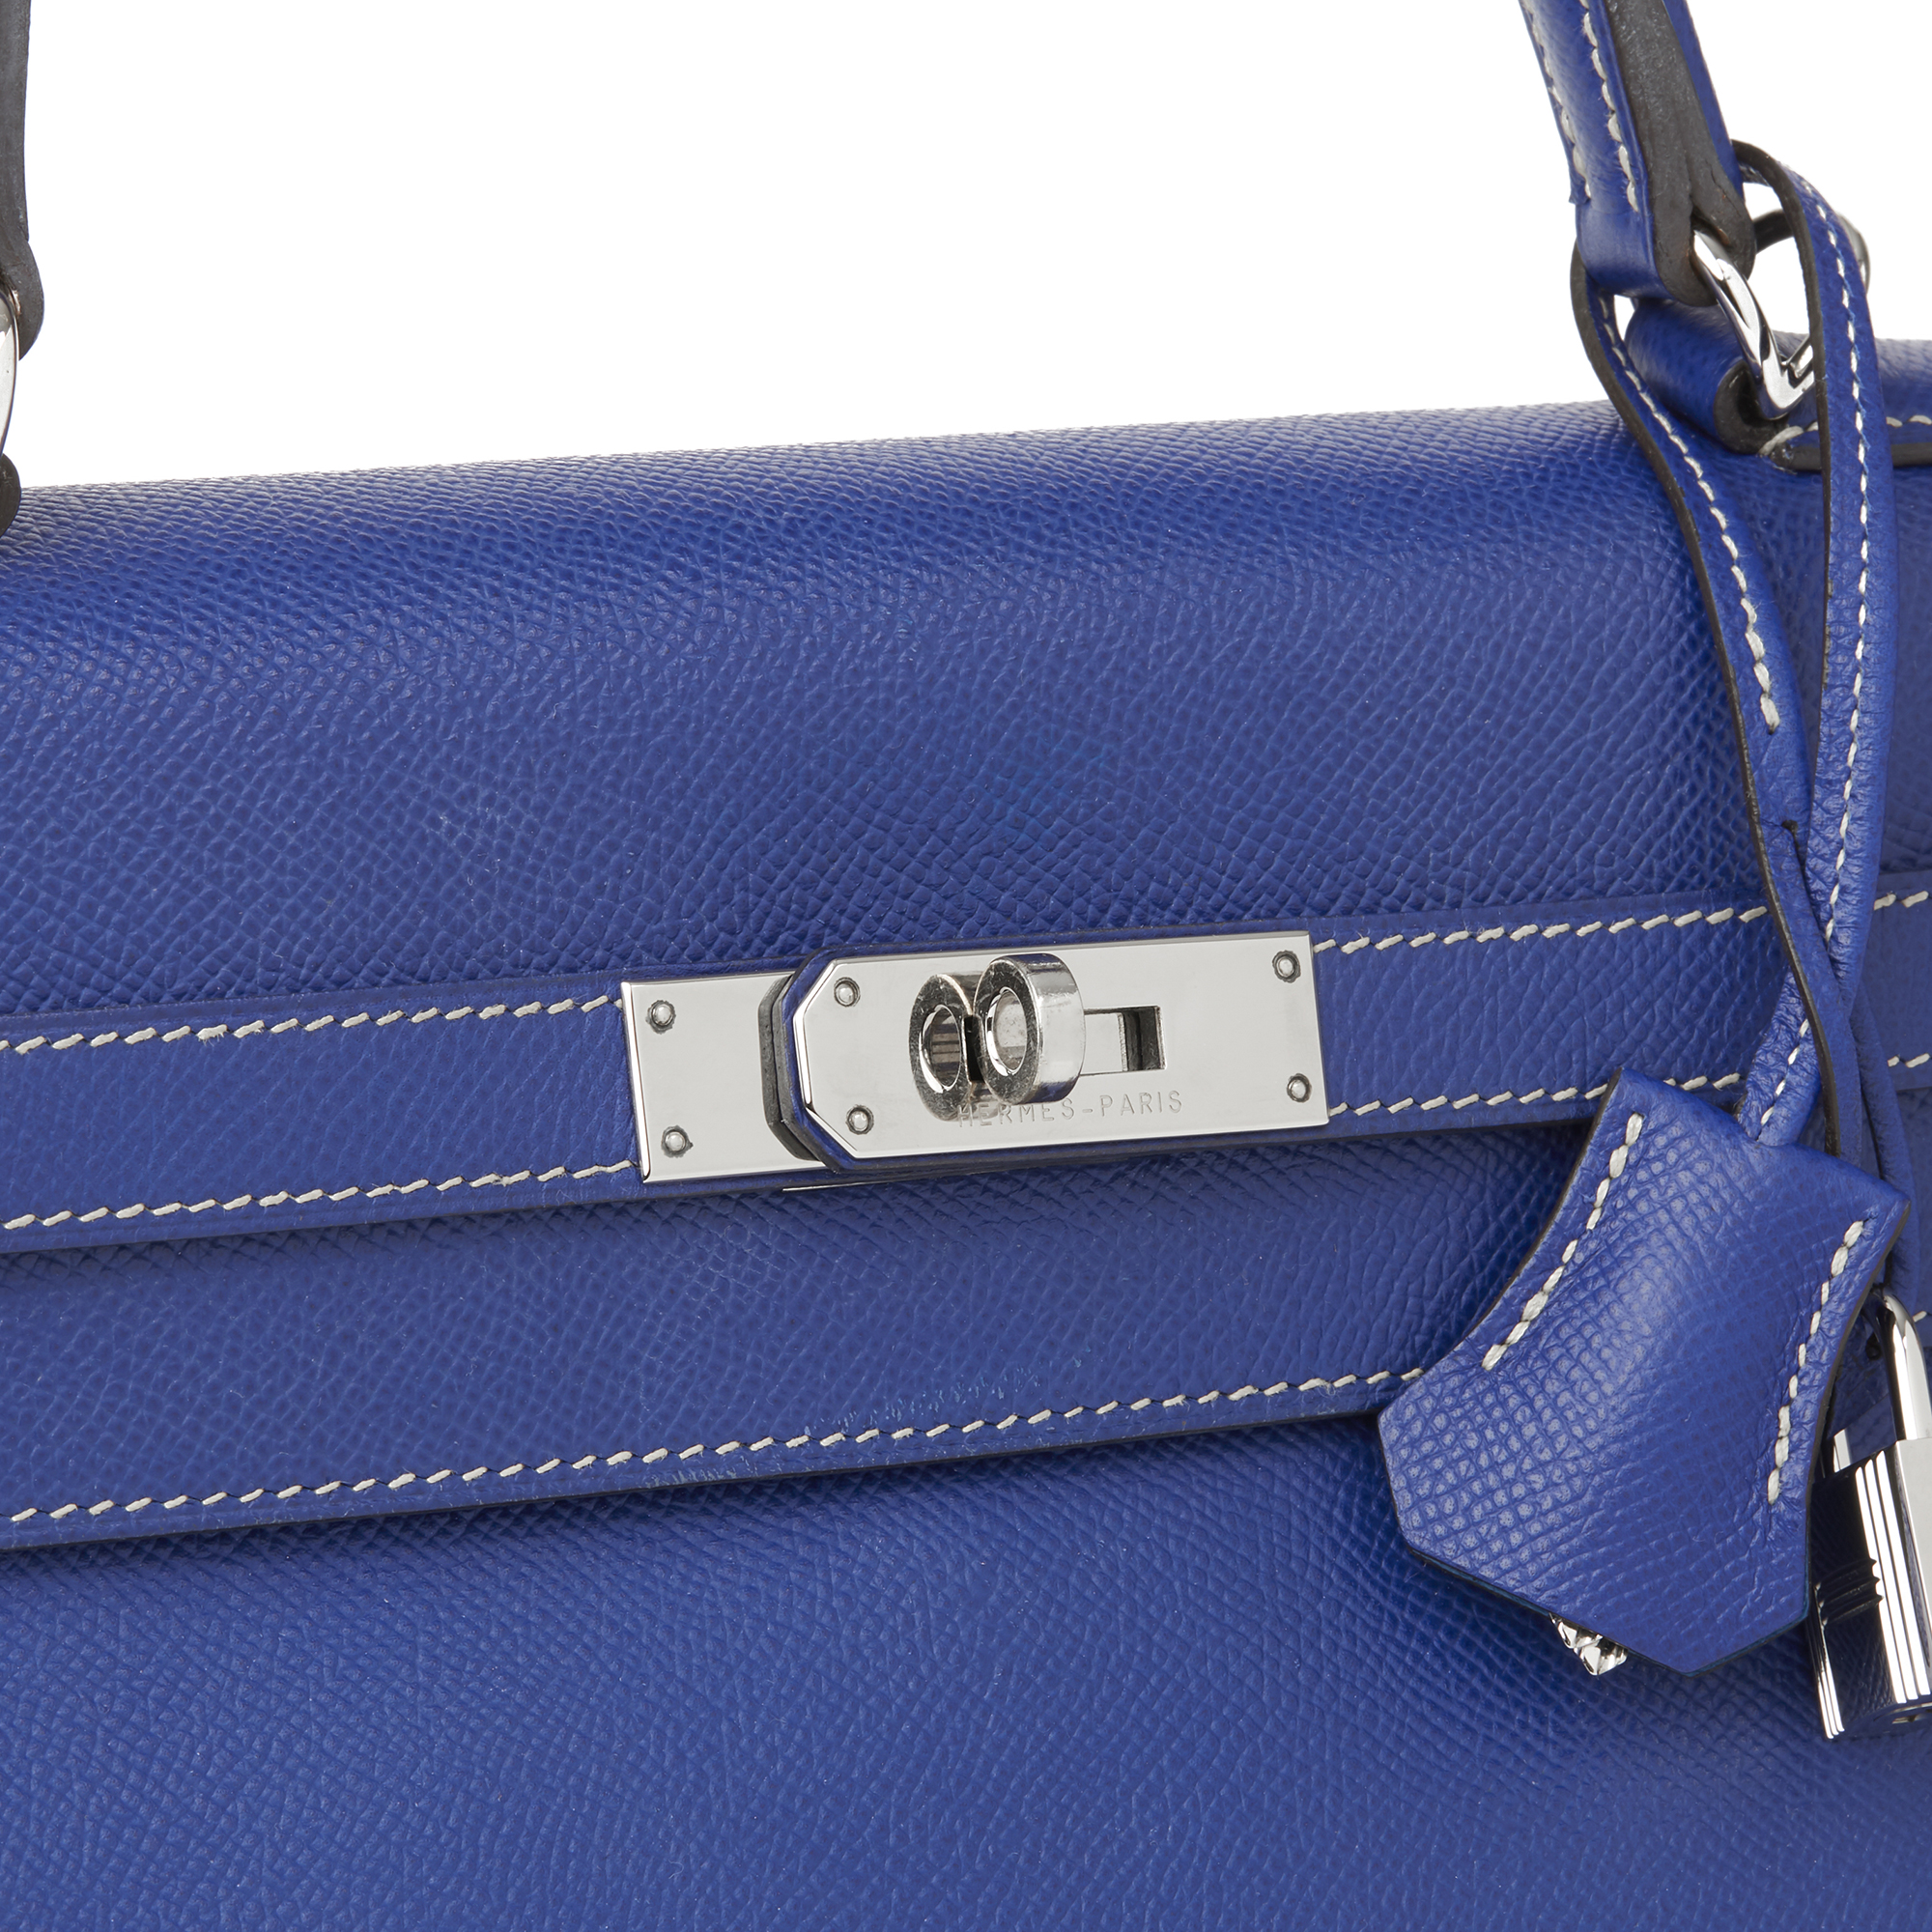 38e4cf38ea Hermès Bleu Electric   Mykonos Epsom Leather Candy Collection Kelly 35cm  Retourne